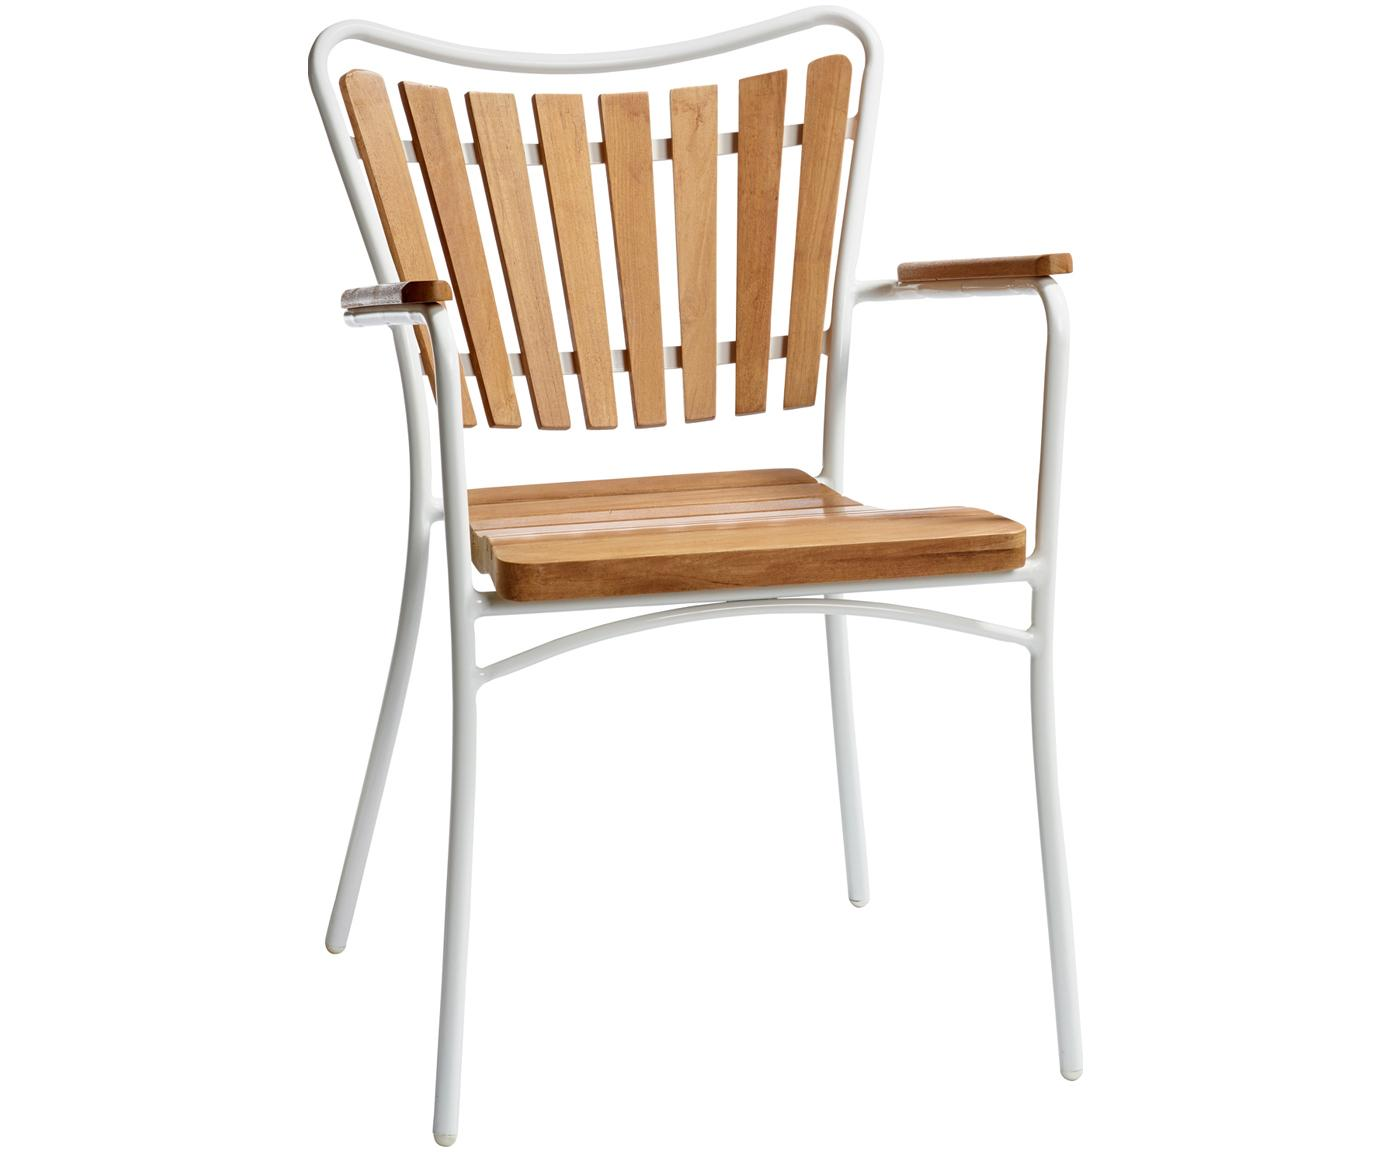 Sedia da giardino Hard & Ellen, Struttura: alluminio verniciato a po, Bianco, teak, Larg. 56 x Alt. 78 cm